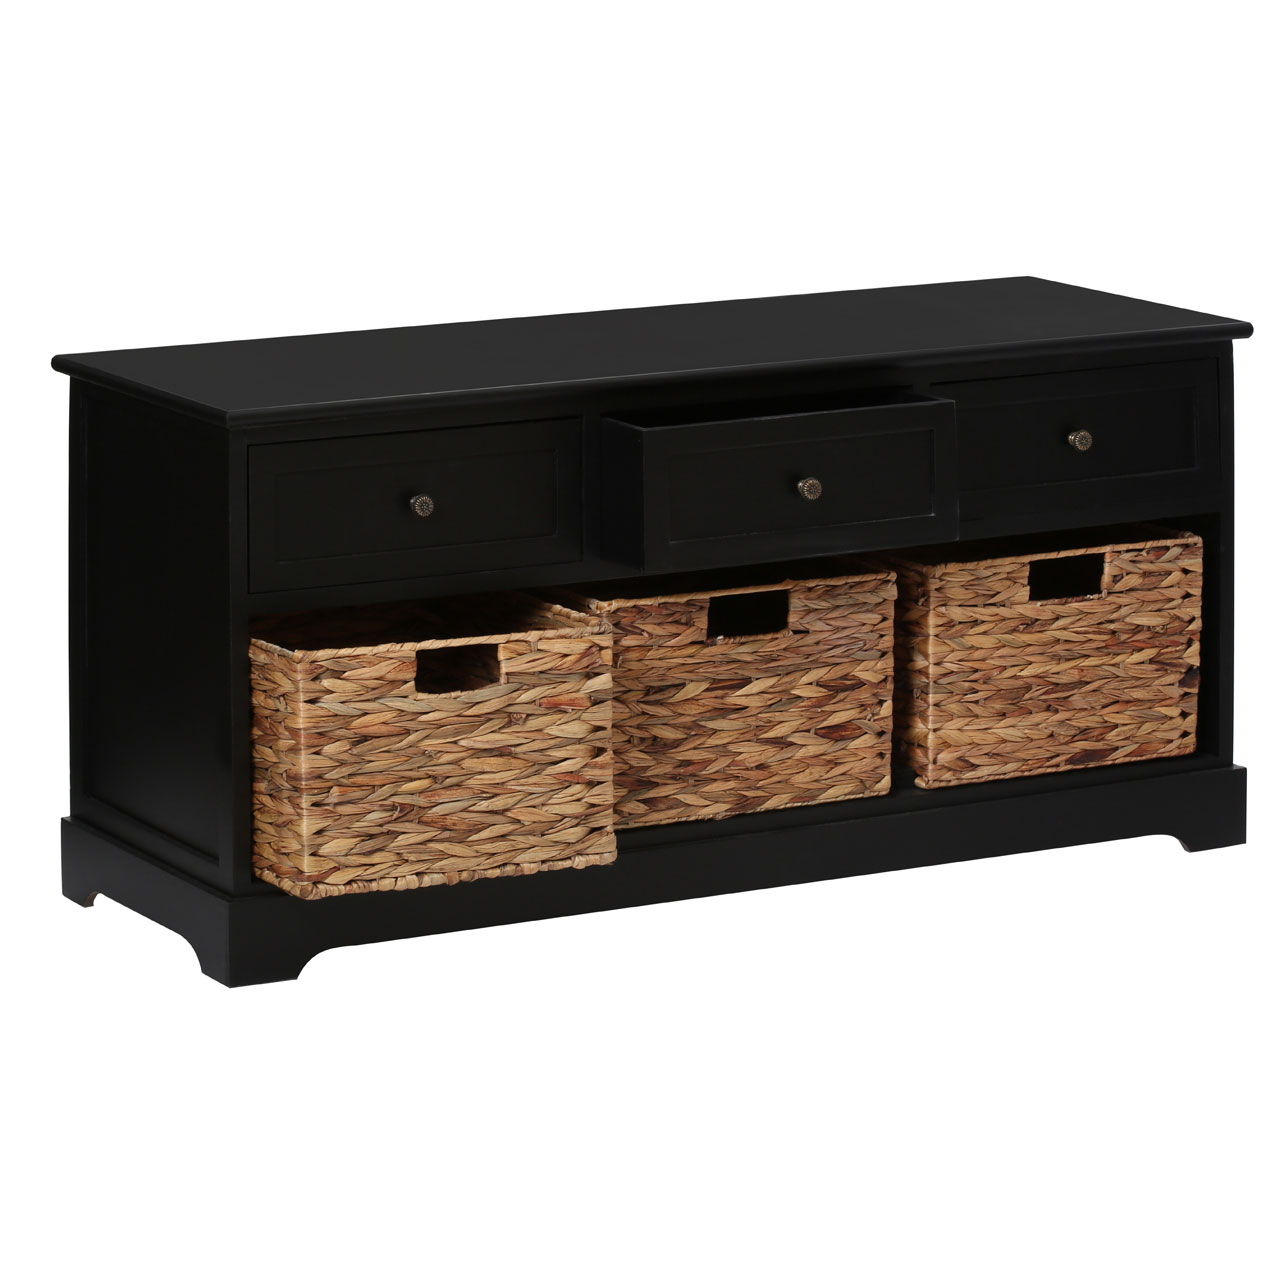 Premier housewares vermont bench drawers baskets